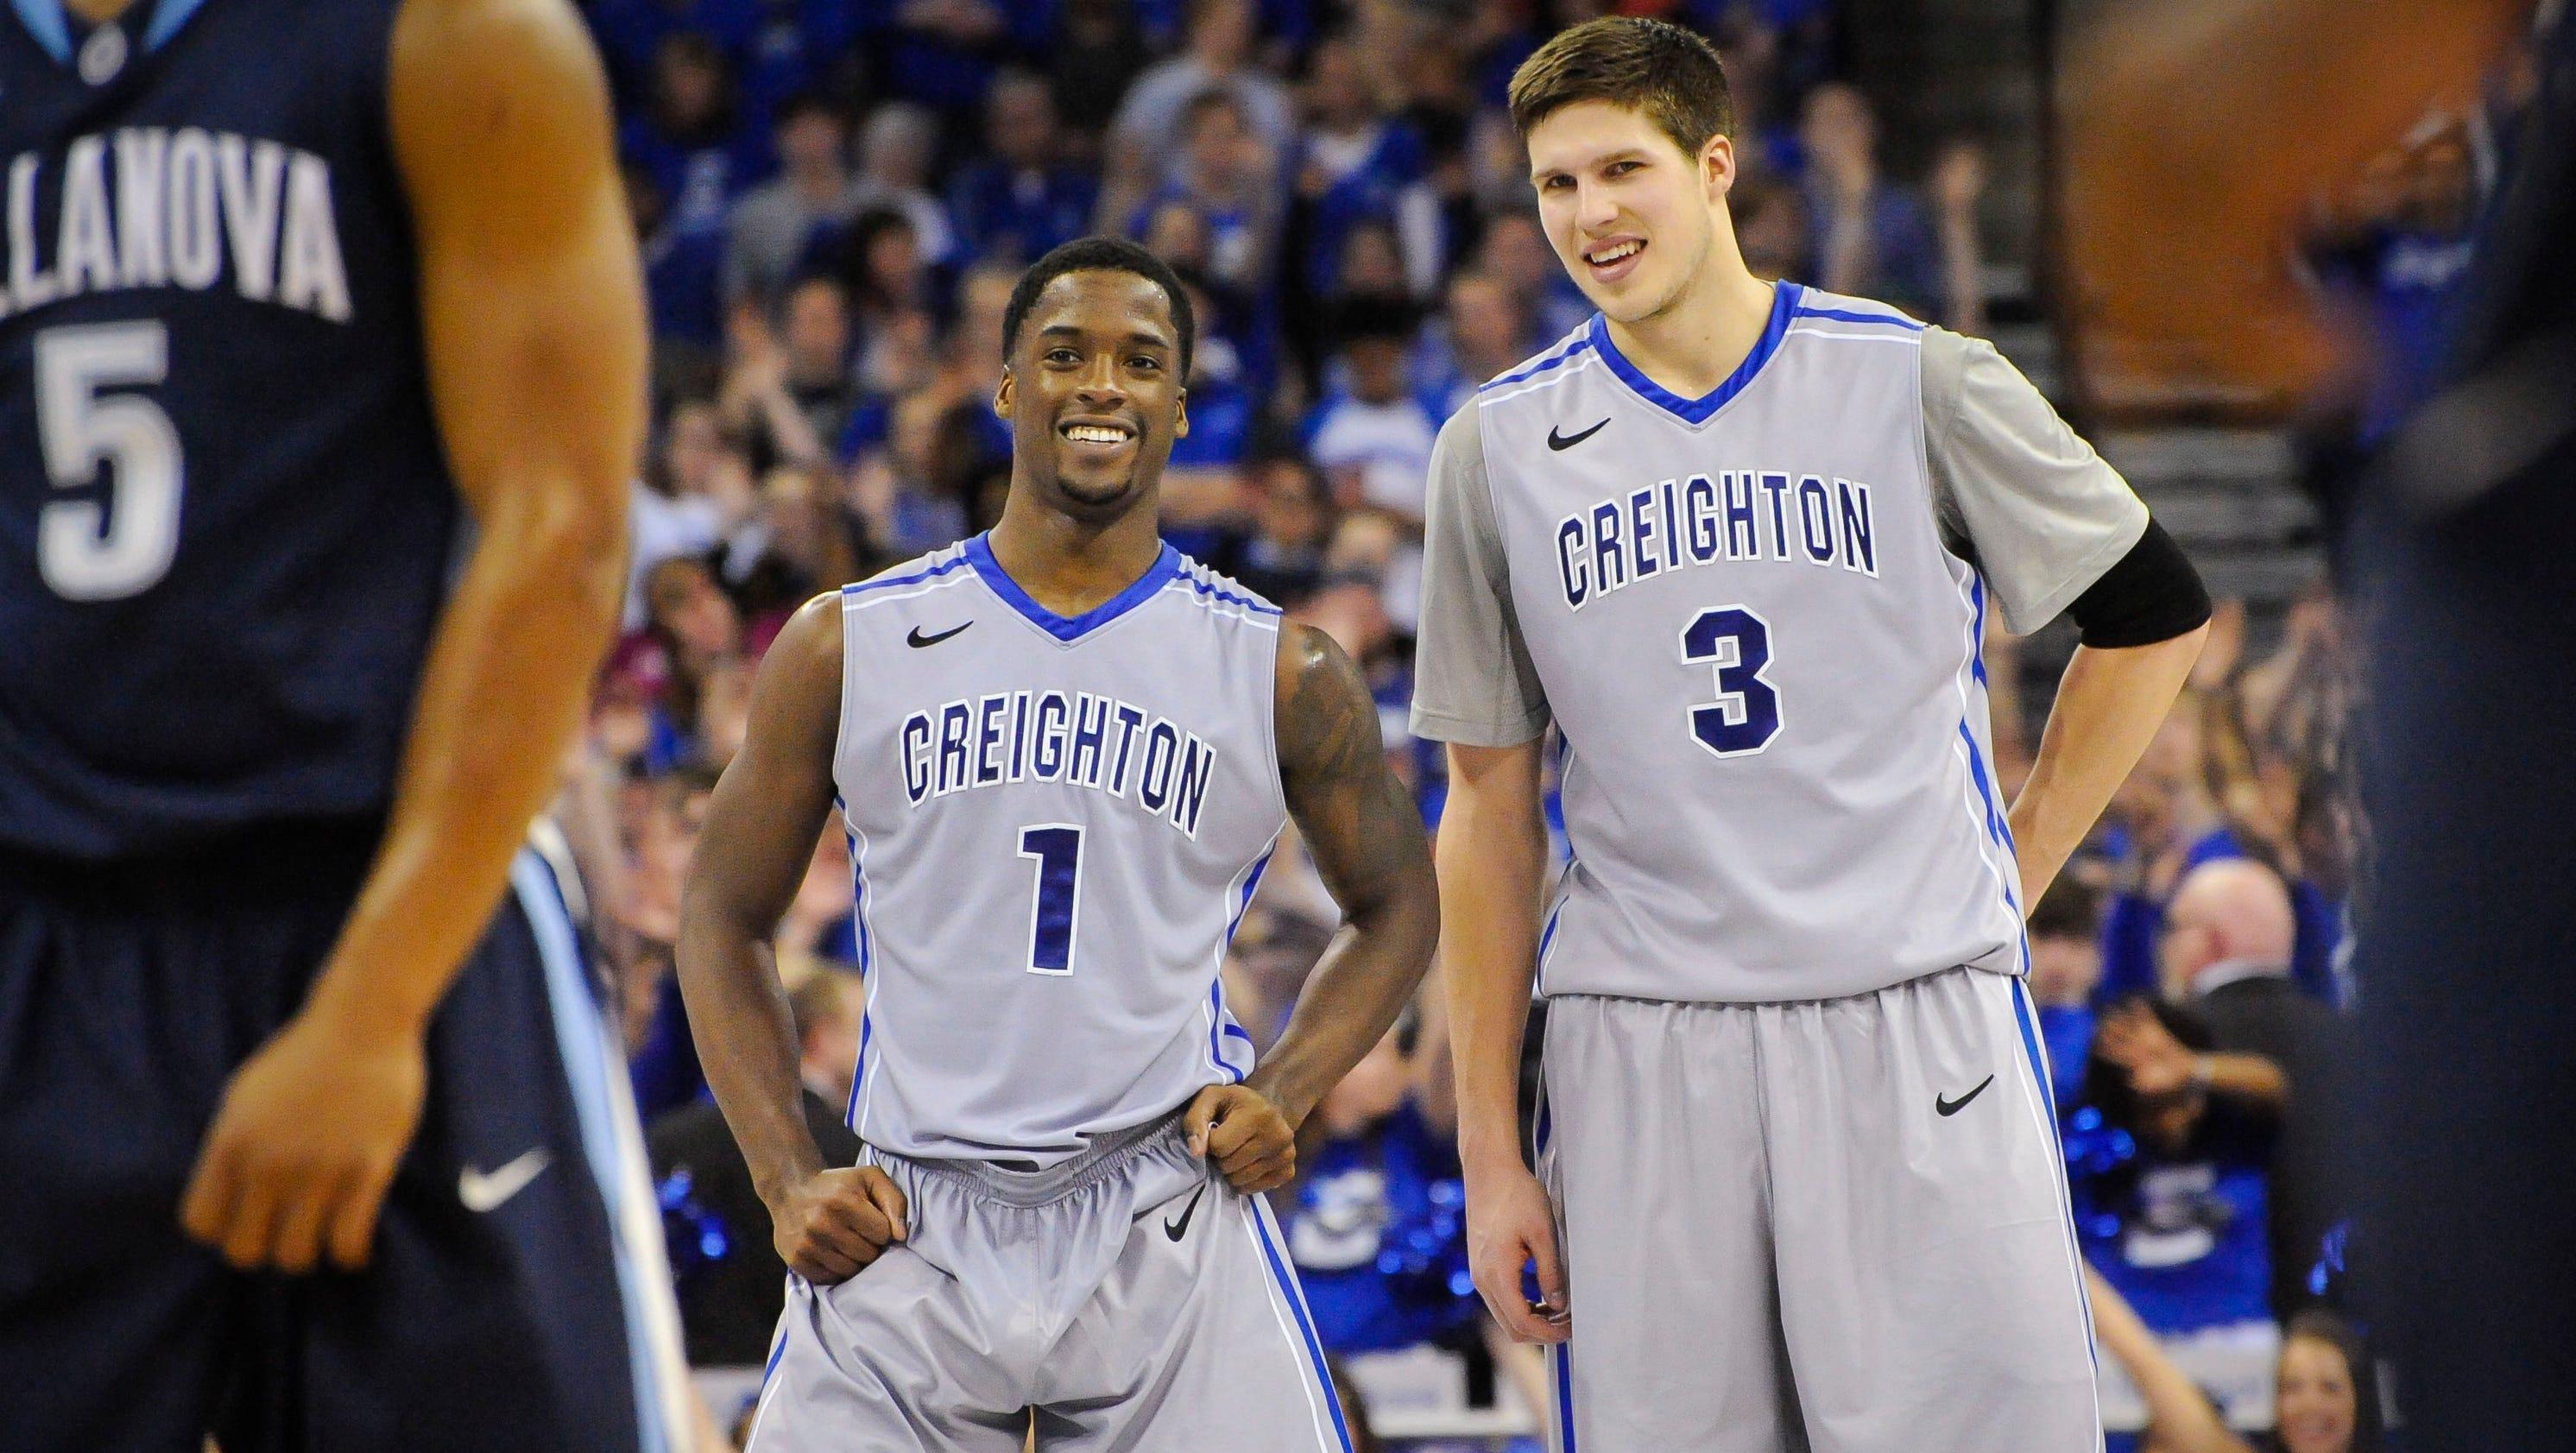 Bracket Briefing: Duke, Creighton jump to No. 2 seeds